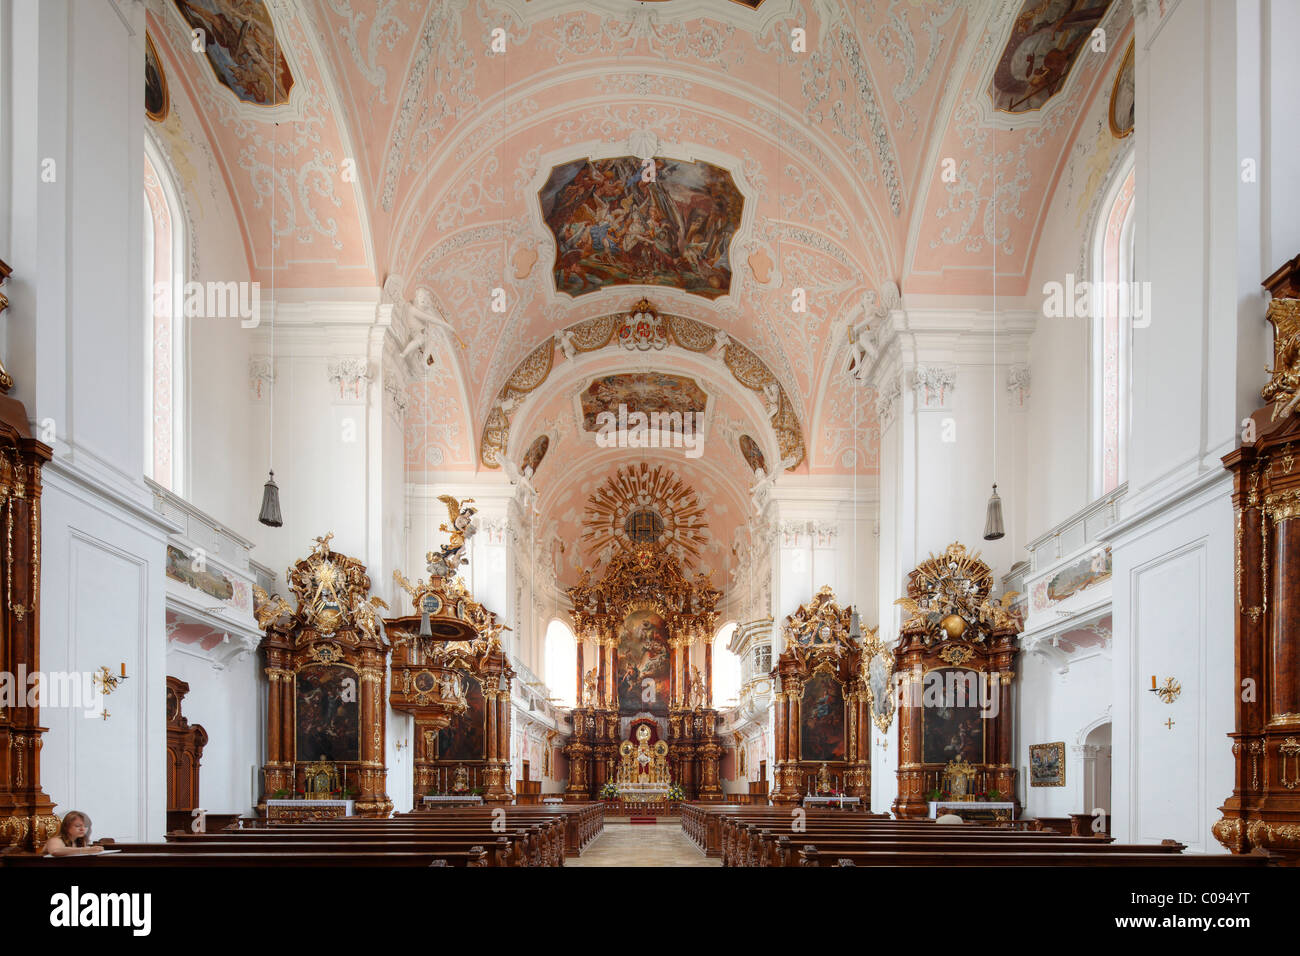 Ange gardien Église, Eichstaett, Altmuehltal, Haute-Bavière, Bavaria, Germany, Europe Photo Stock